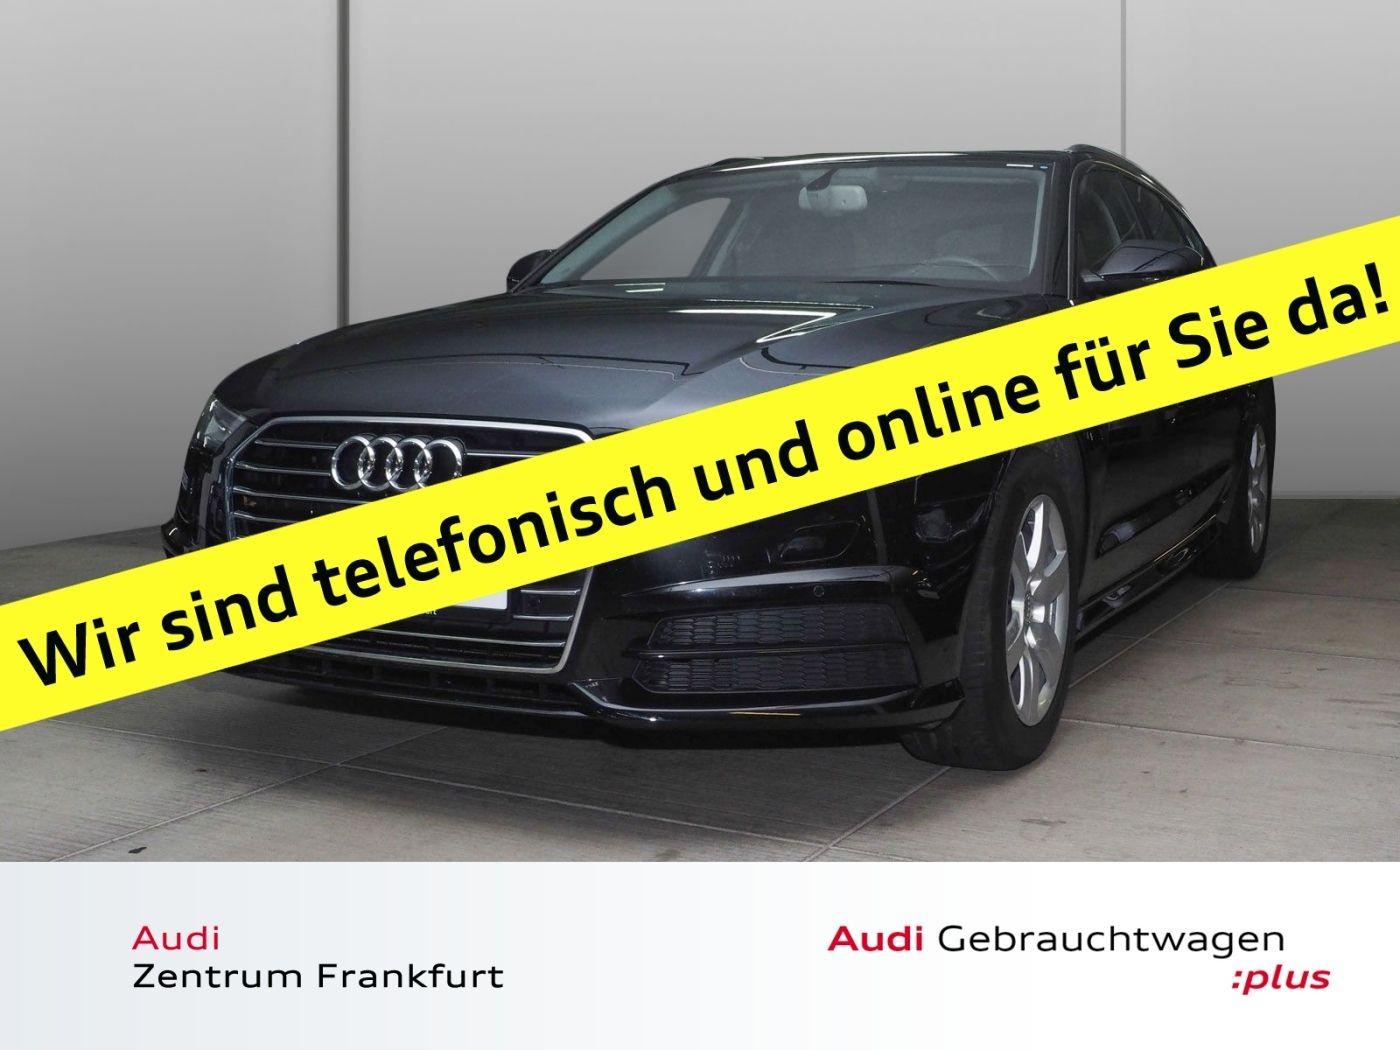 Audi A6 Avant 2.0 TDI S tronic Navi Xenon PDC Sitzheizung Tempomat, Jahr 2017, Diesel